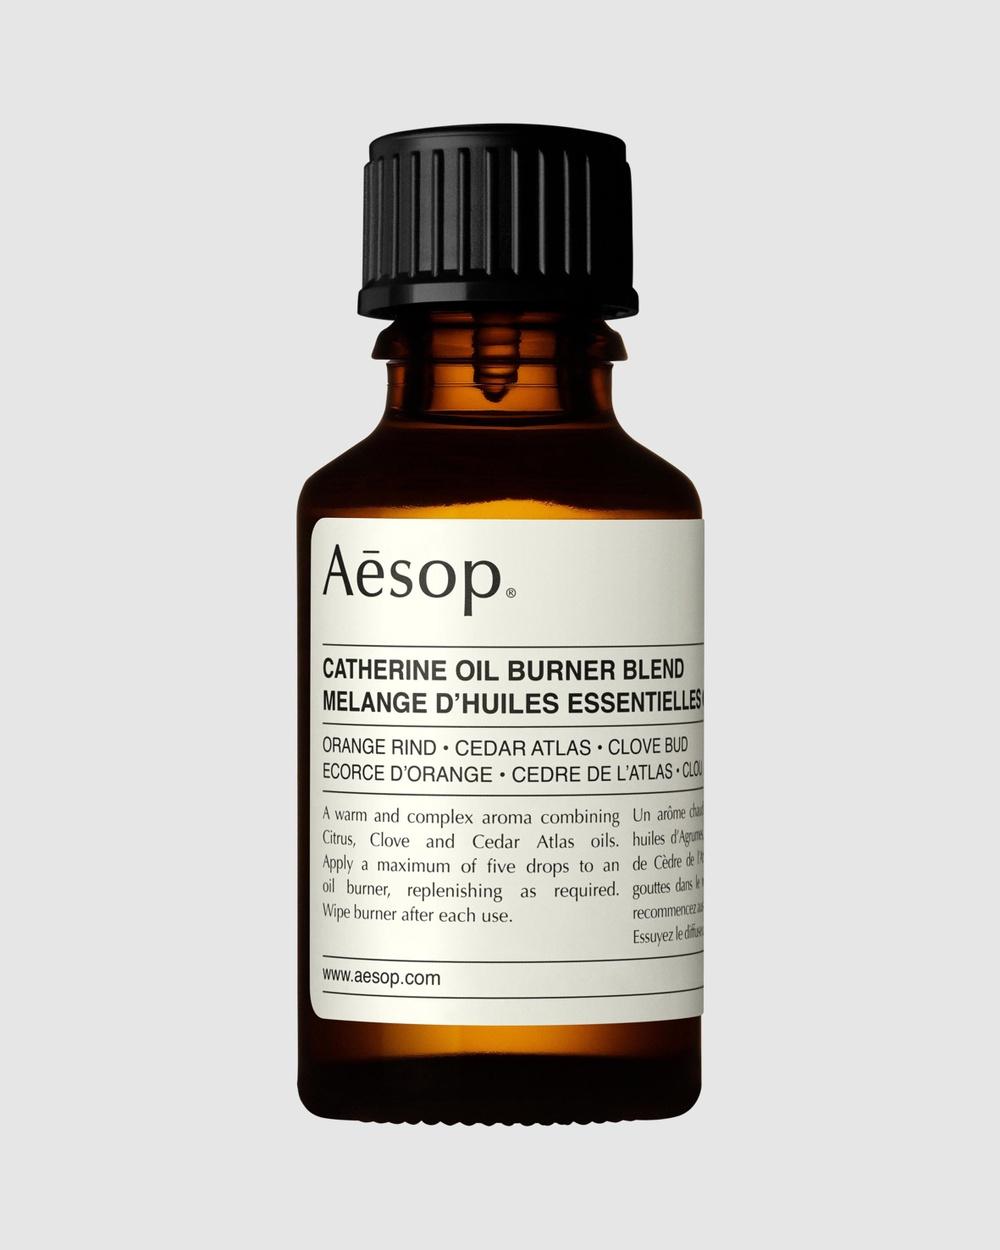 Aesop Catherine Burner Blend 25mL Essential Oils N/A